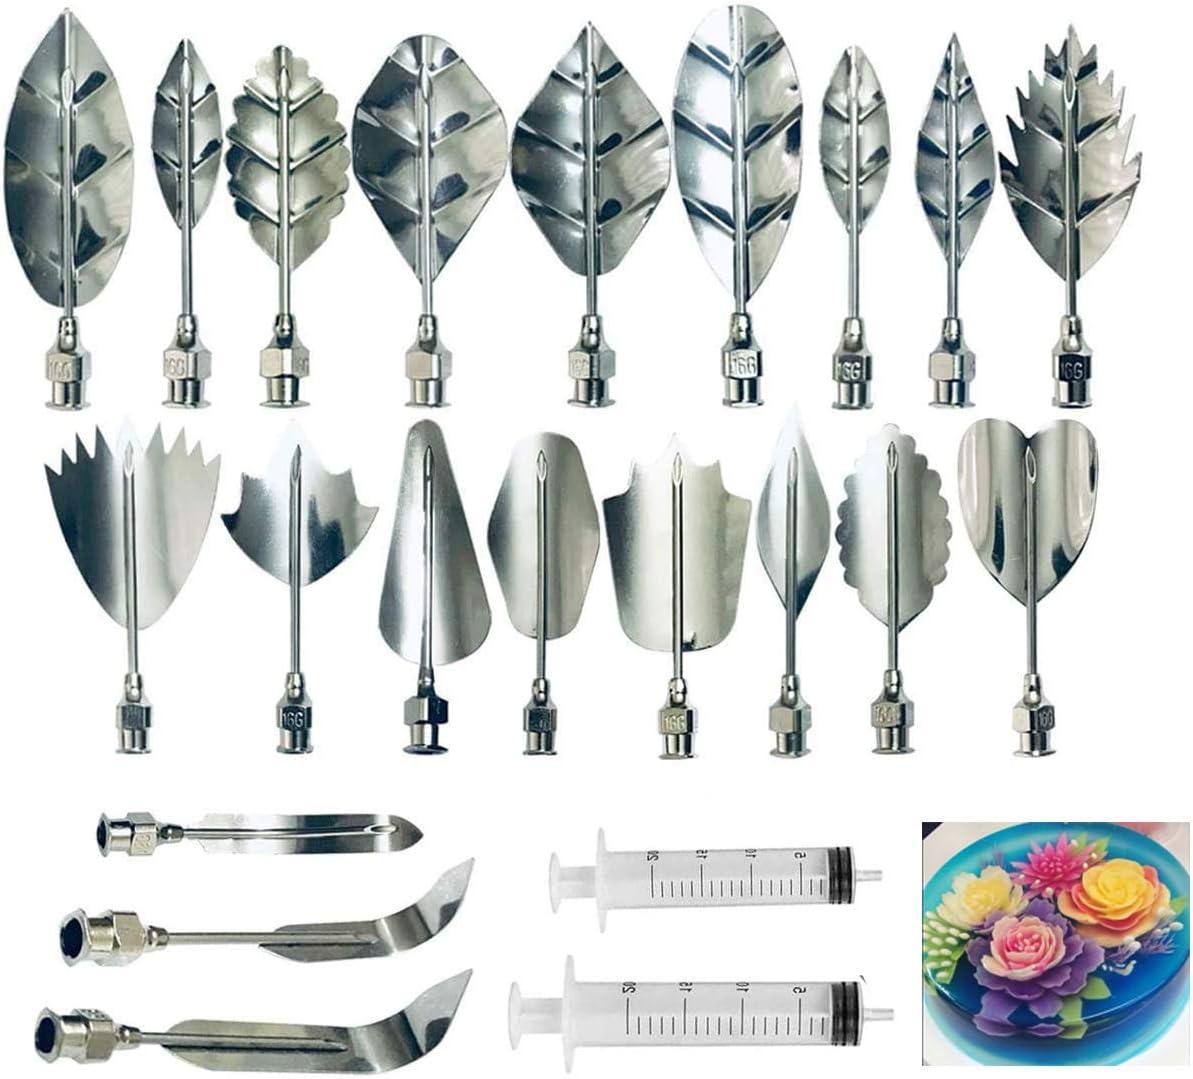 Gelatin Art Starter Kit - 3D Jelly Flower Cake Decorating Tool Set of 20 Piece DIY Needle Tips Pastry Tools